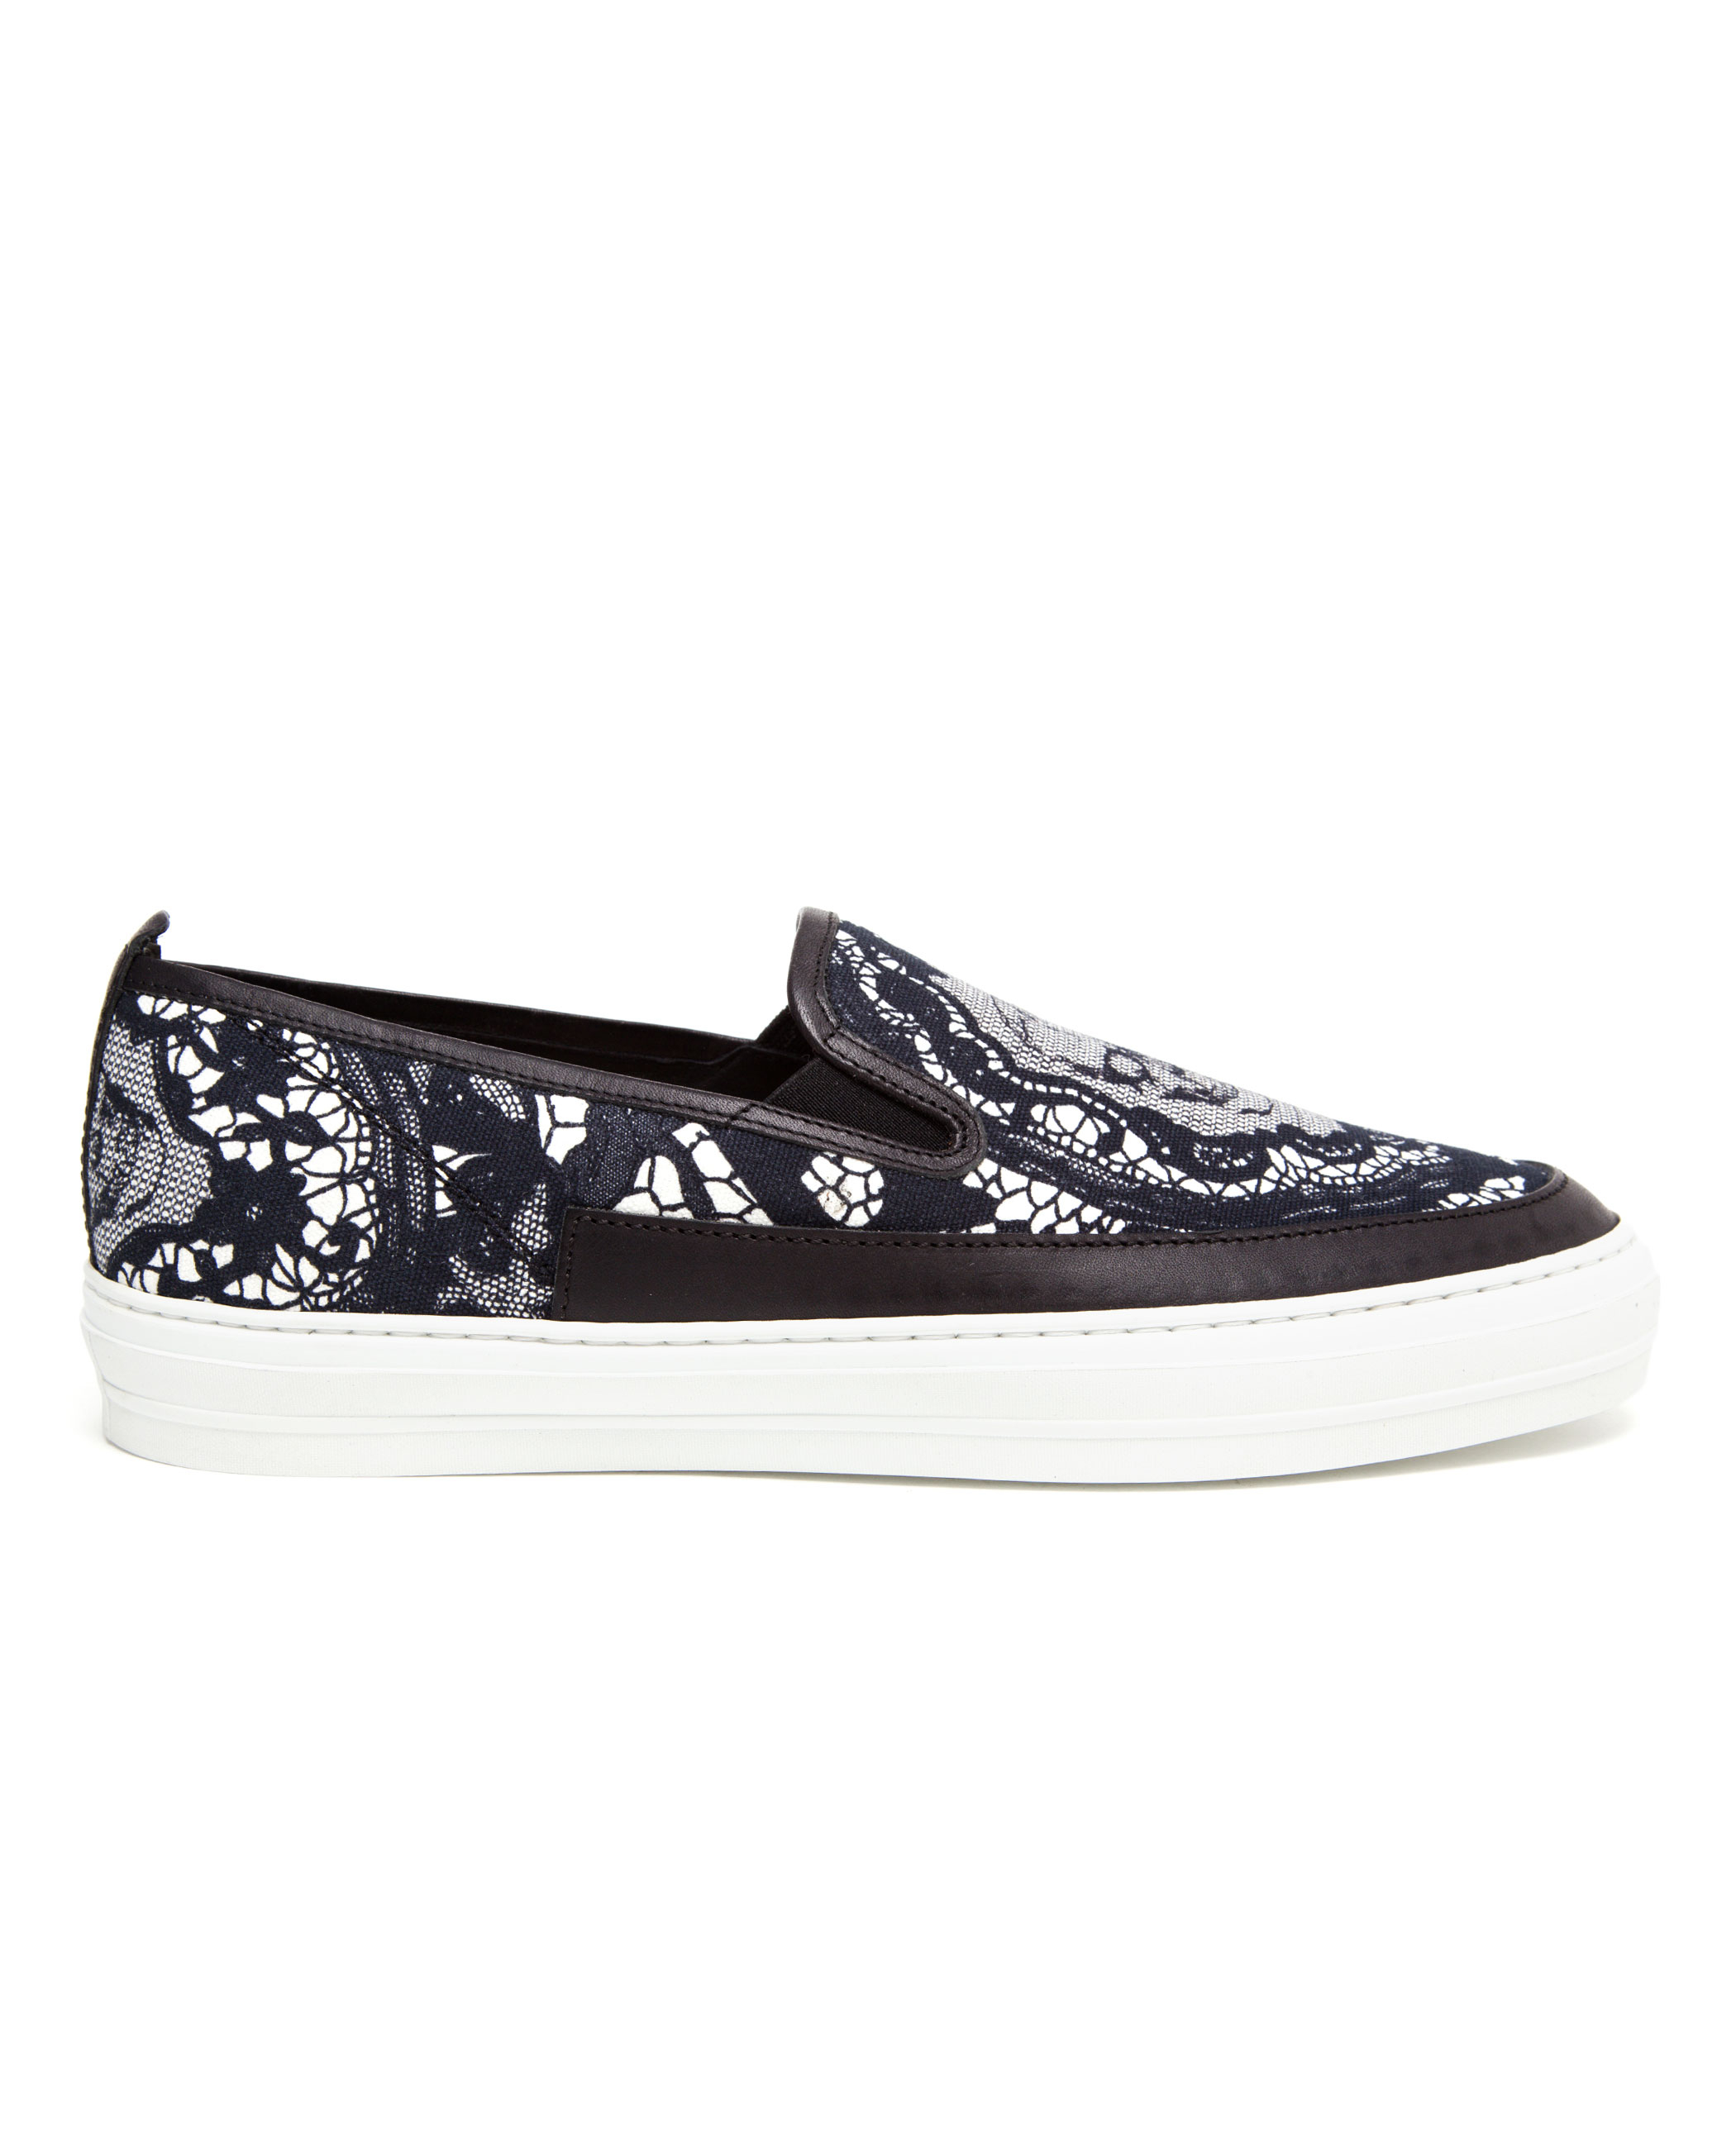 Joe Browns Canvas Shoes